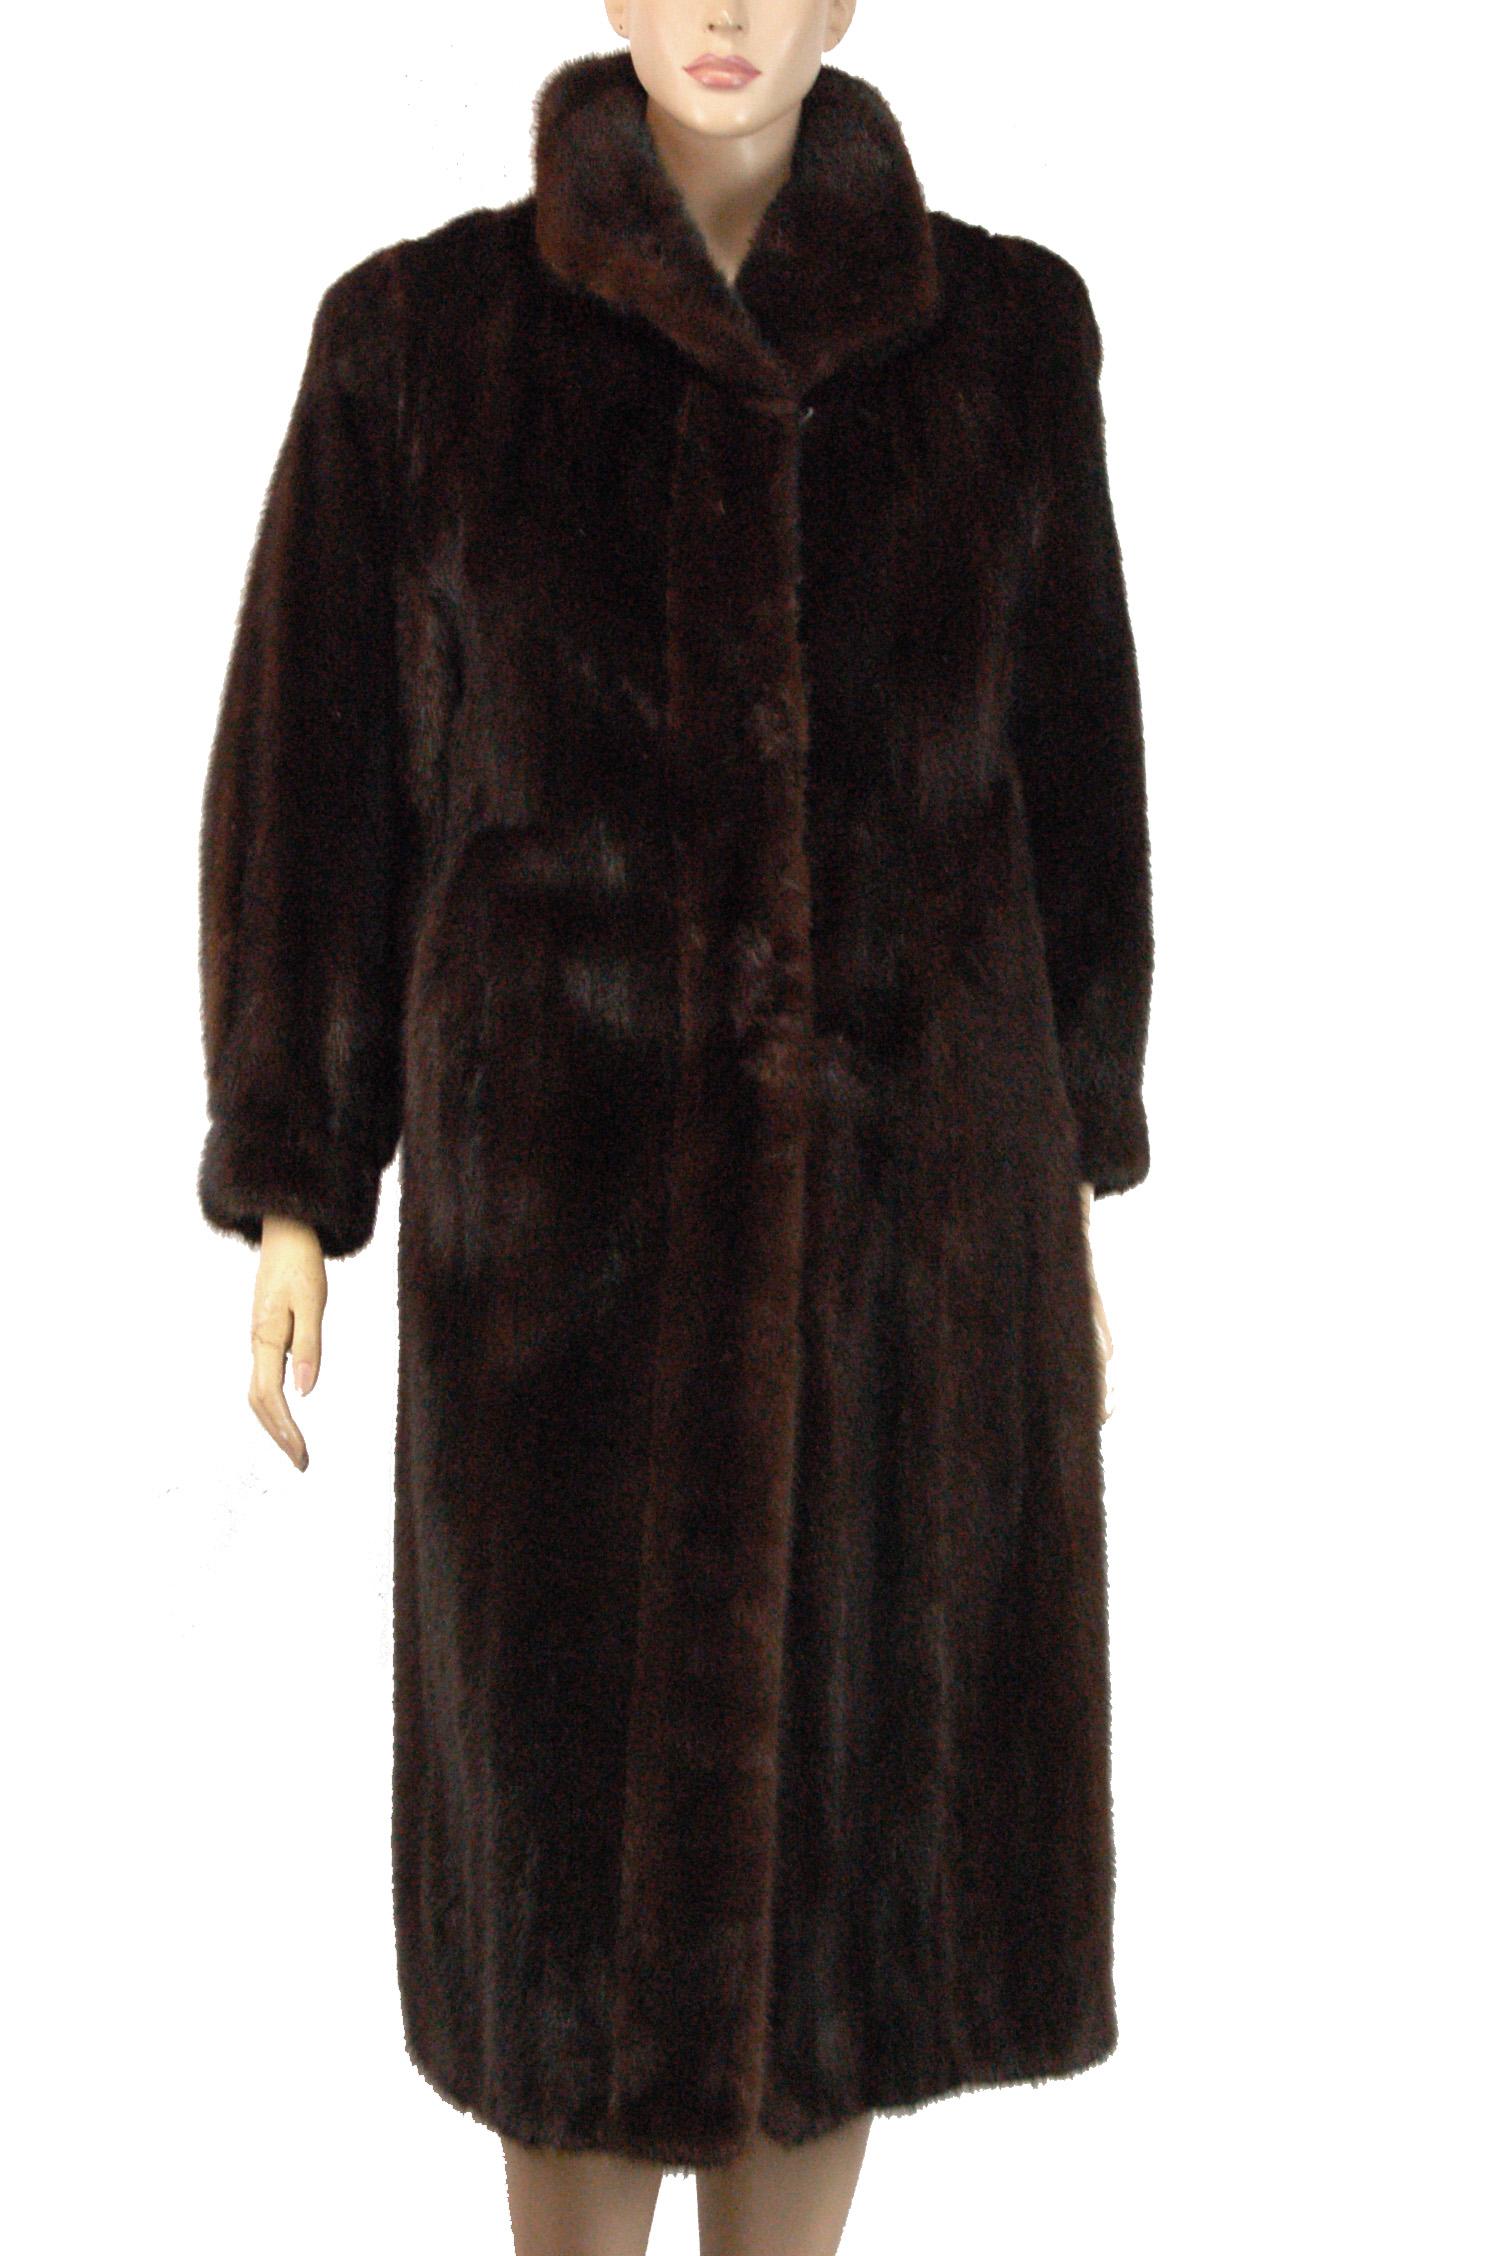 8e9f52018 Image 1 of 7. Women's MINK ! Full Length Dark Mahogany Fur Coat ...